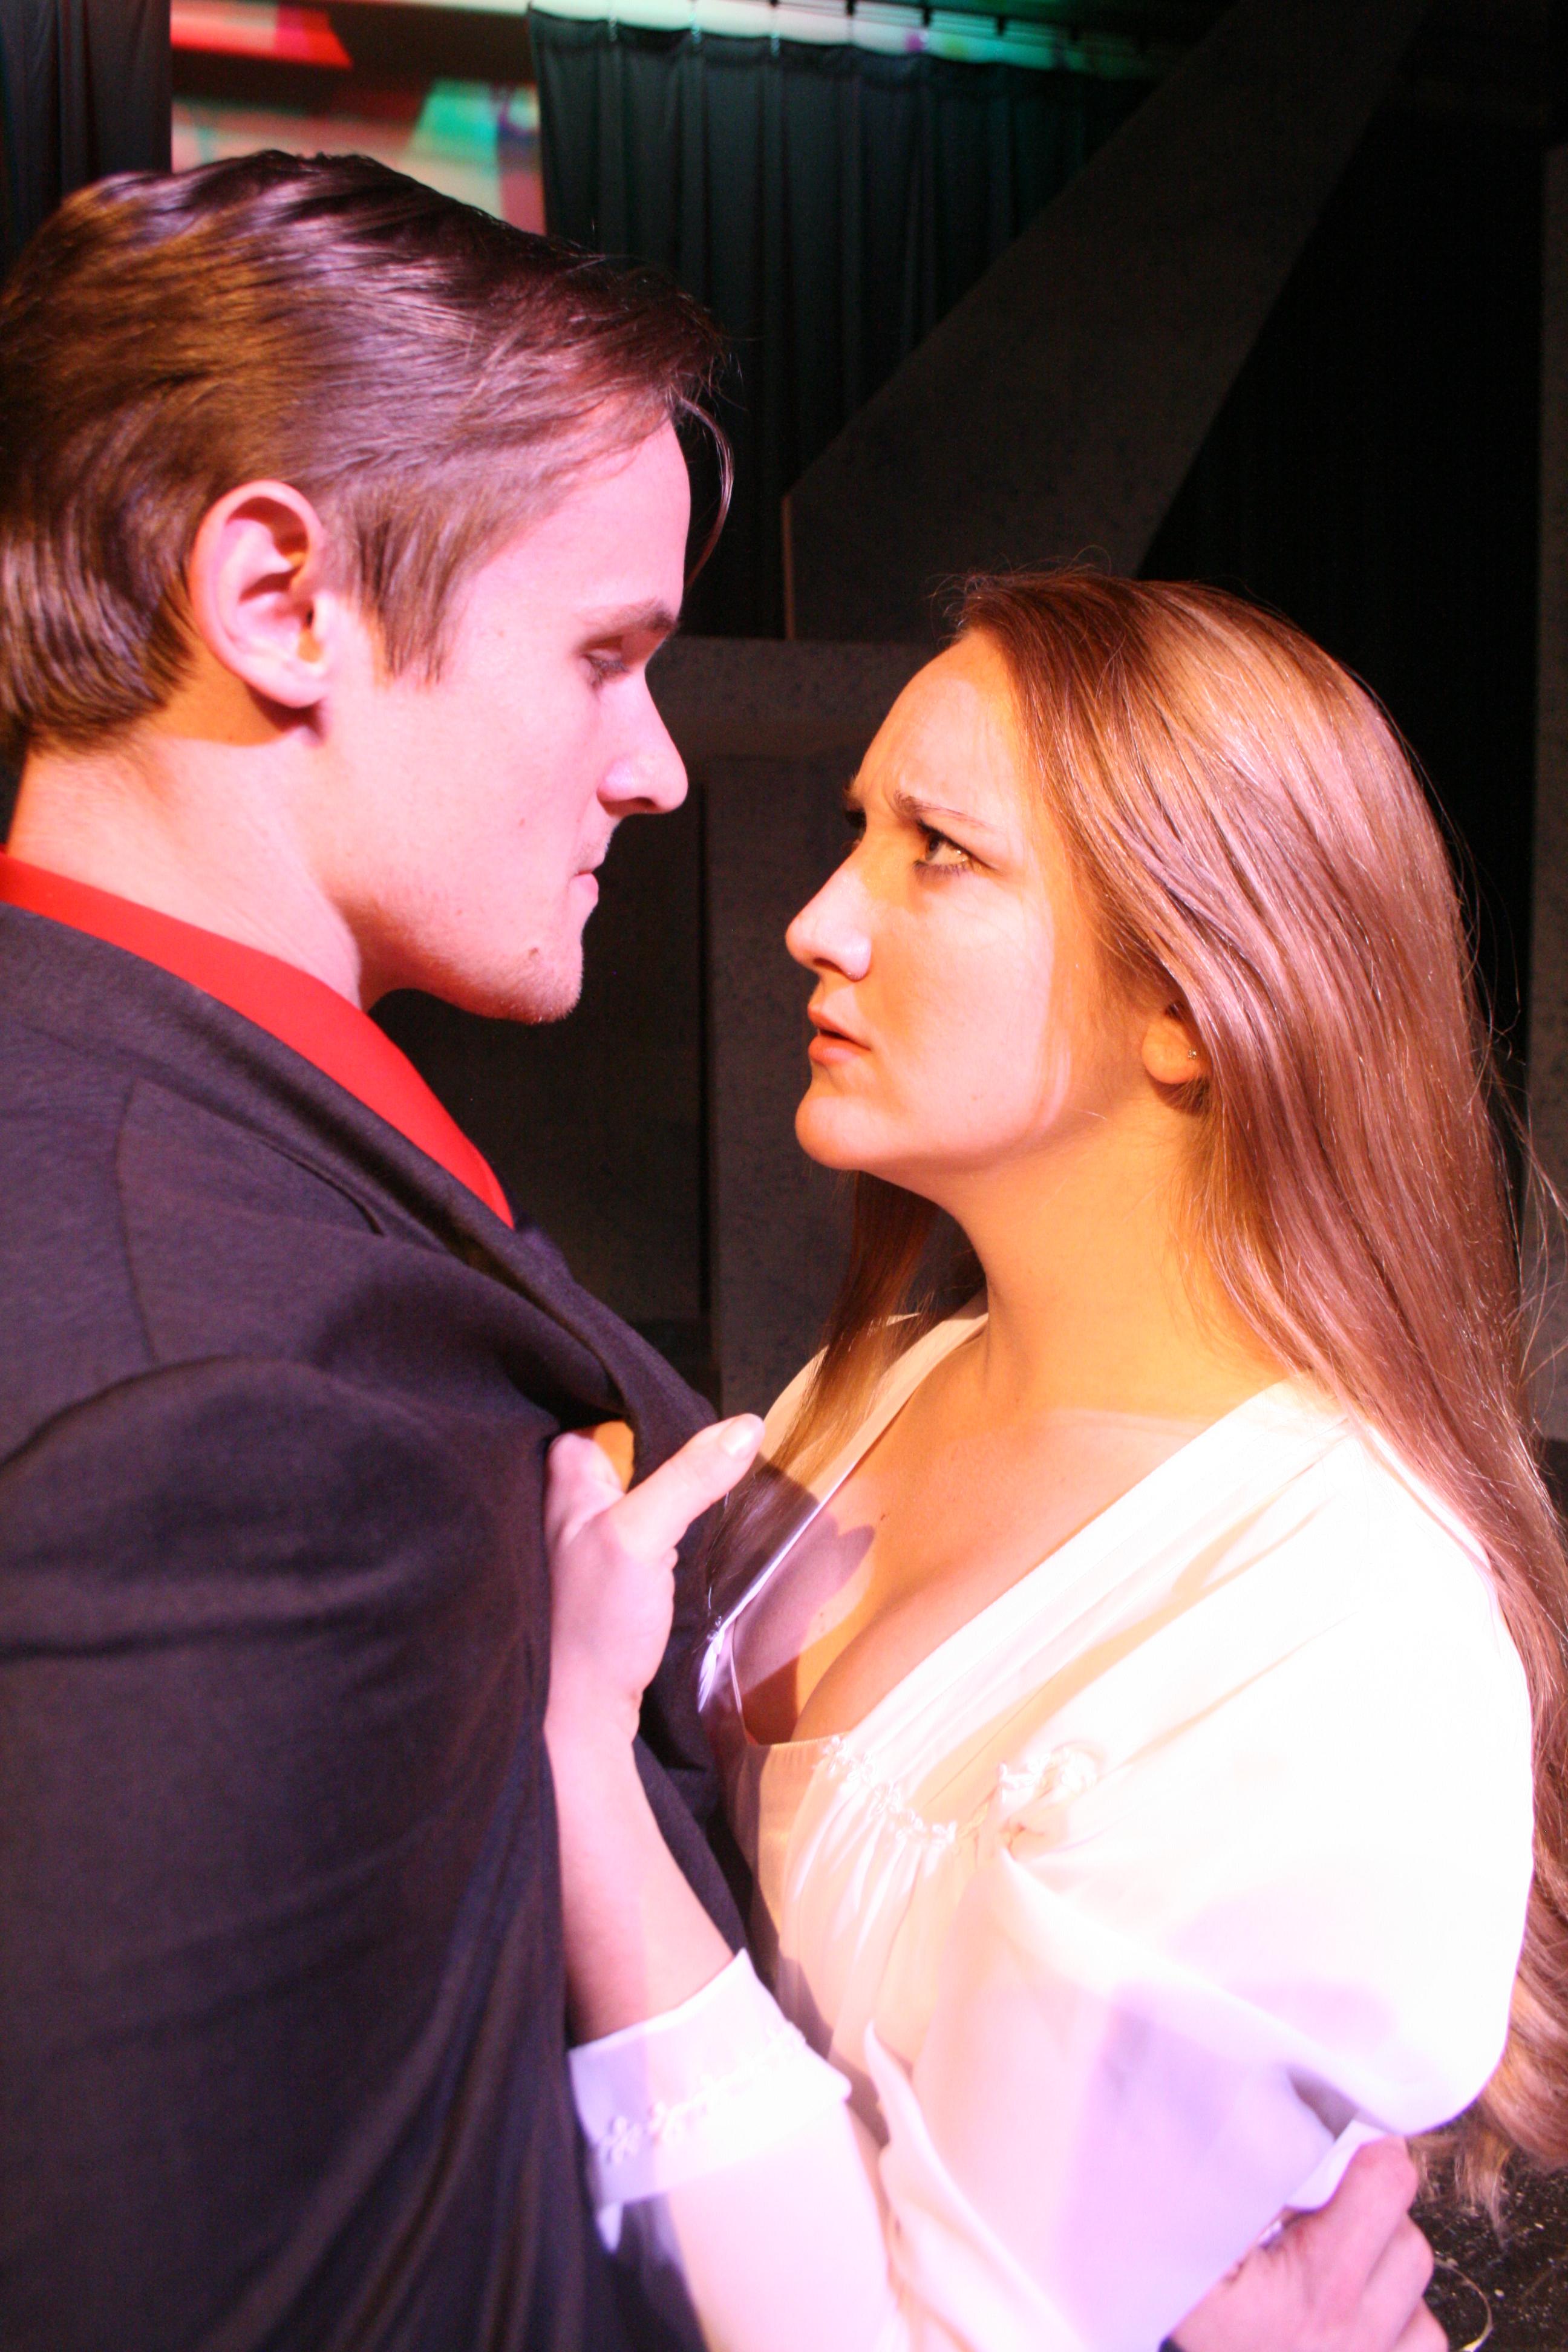 IMG_8348 - by Evan Goetz - Walter Pigford(Brutus) and Megan Dyer(Portia)